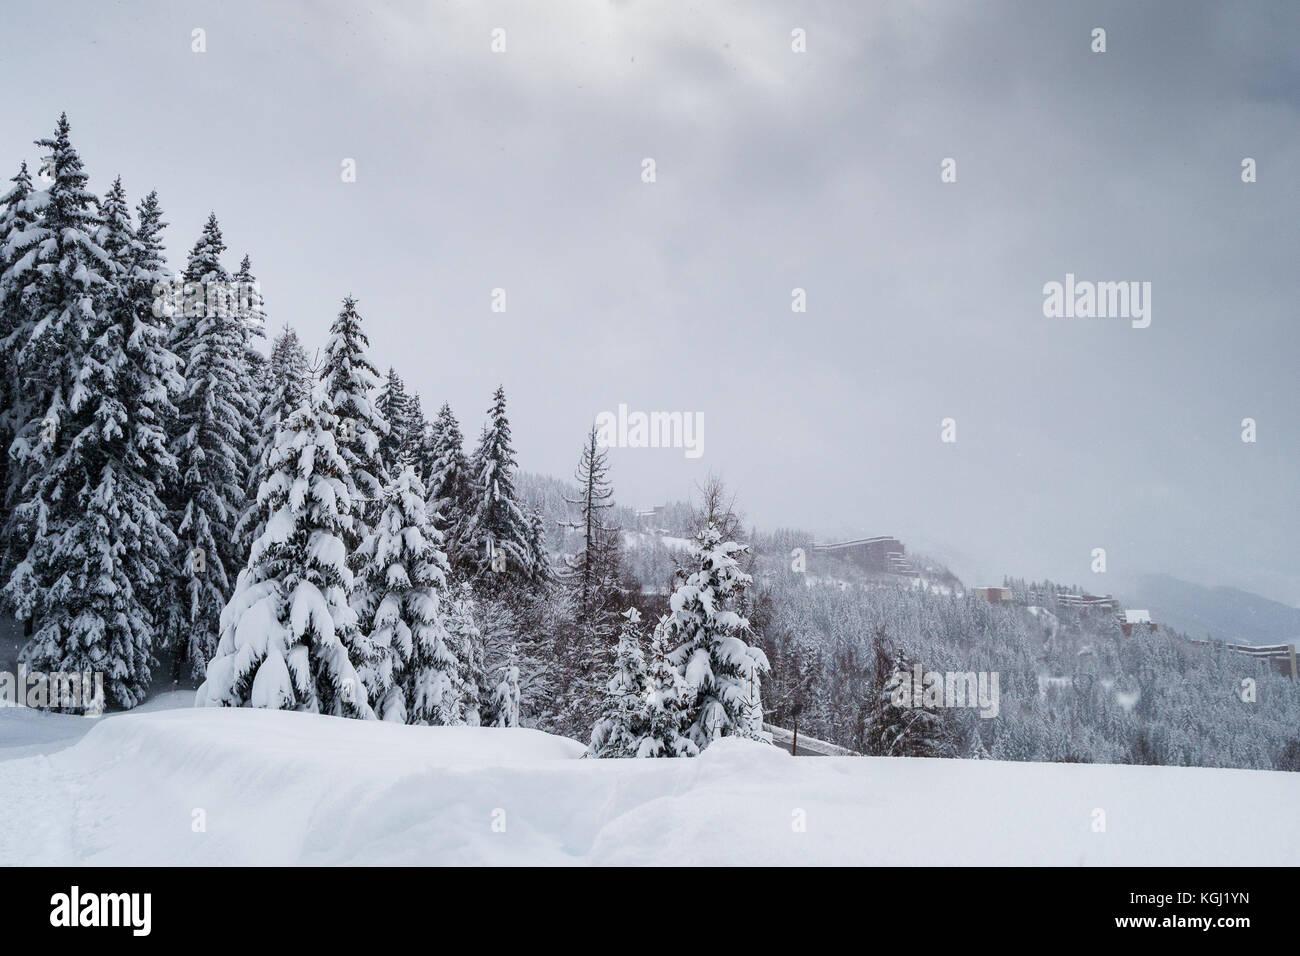 Winter Scene with Pine trees. Les Arcs, Savoie. France - Stock Image